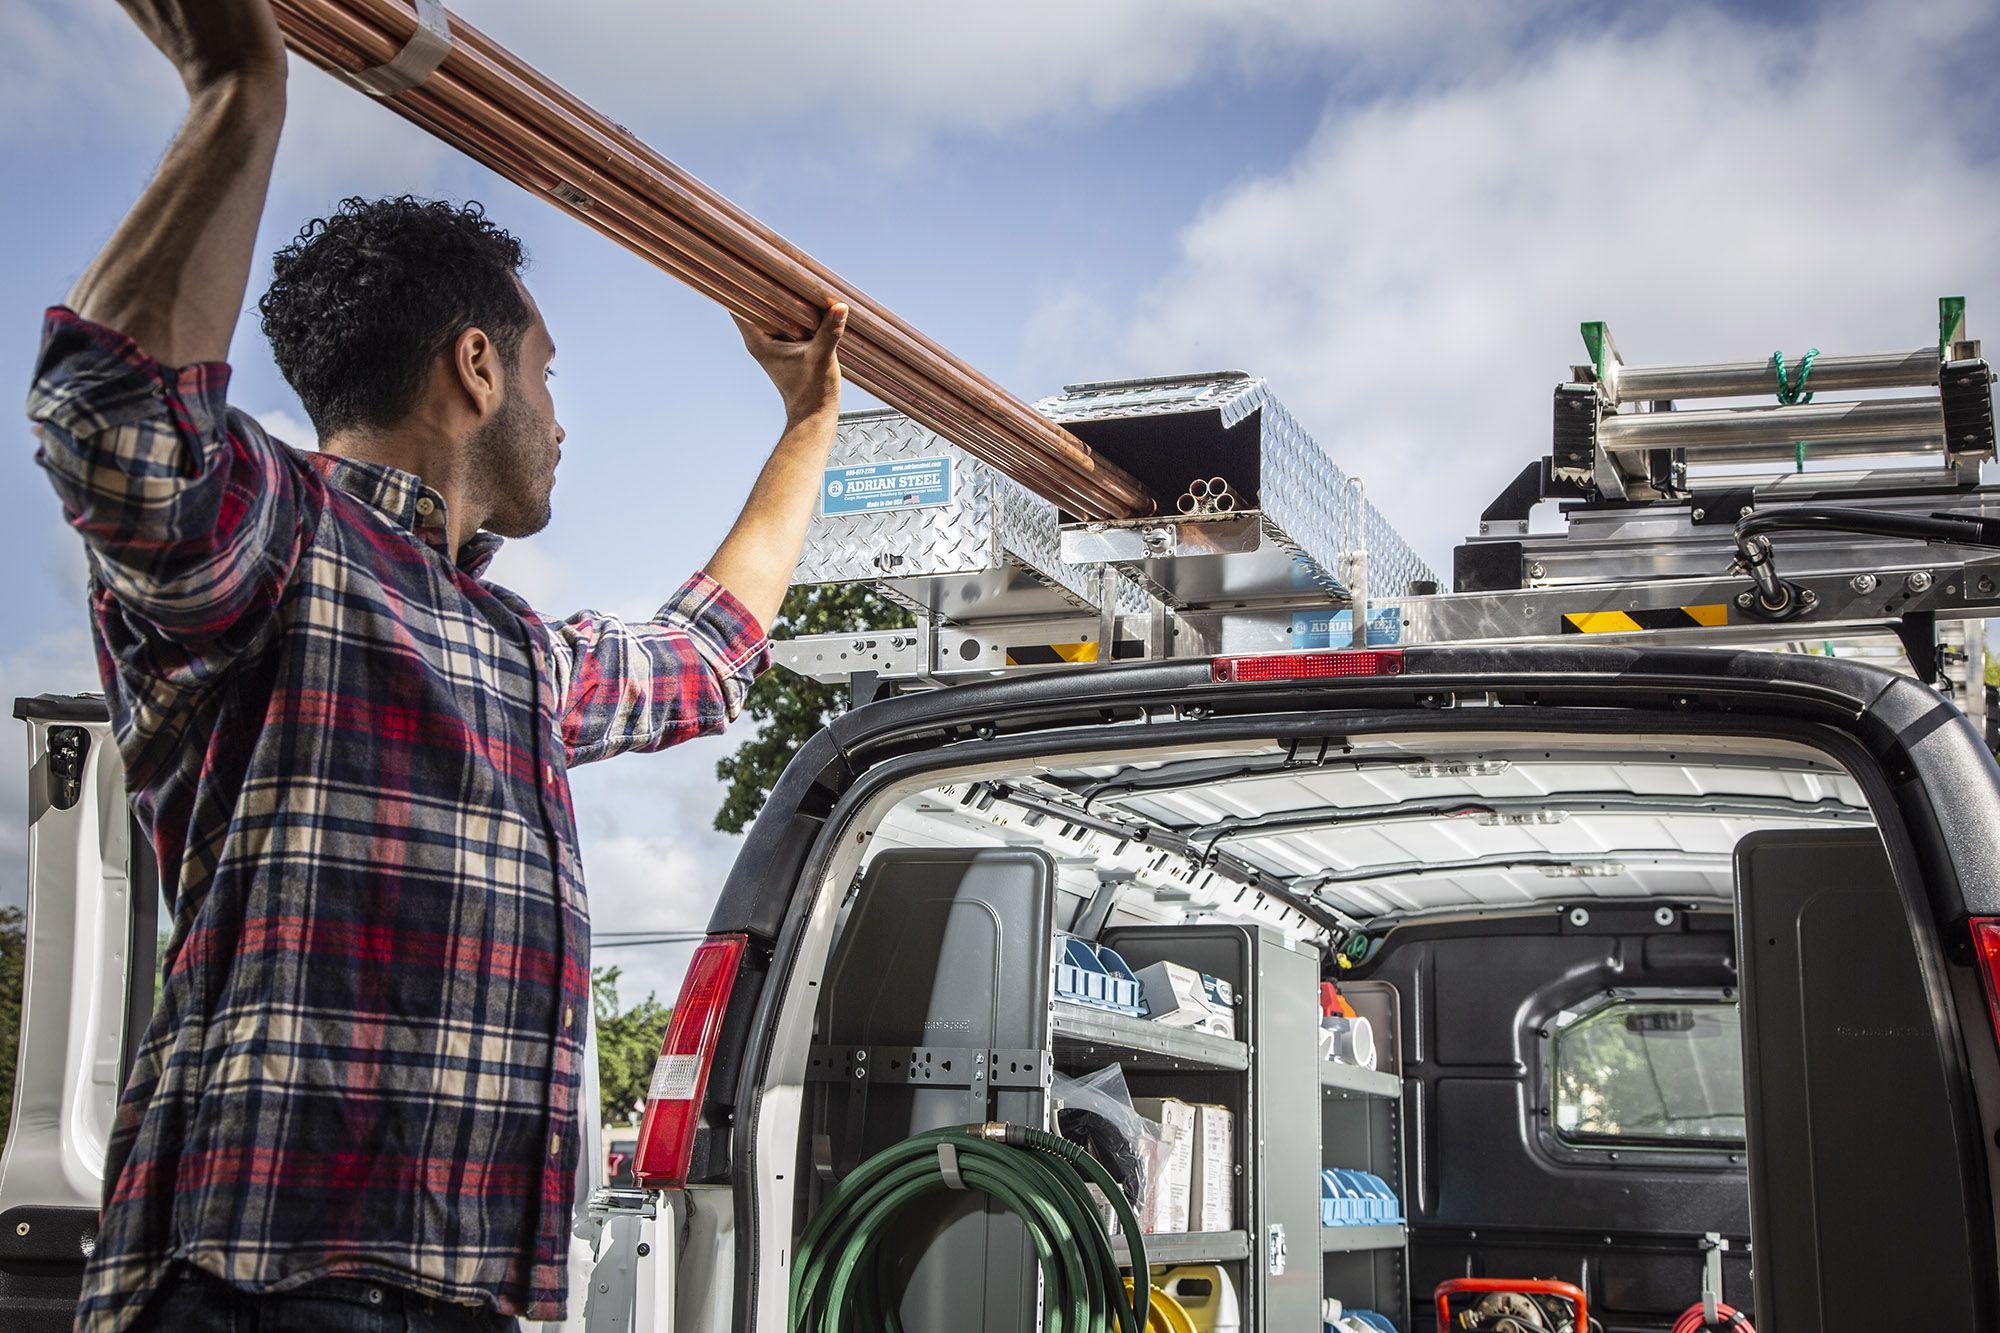 Secure Your Ladders Cargo Ladder Rack Ladder Racks For Vans Van Accessories